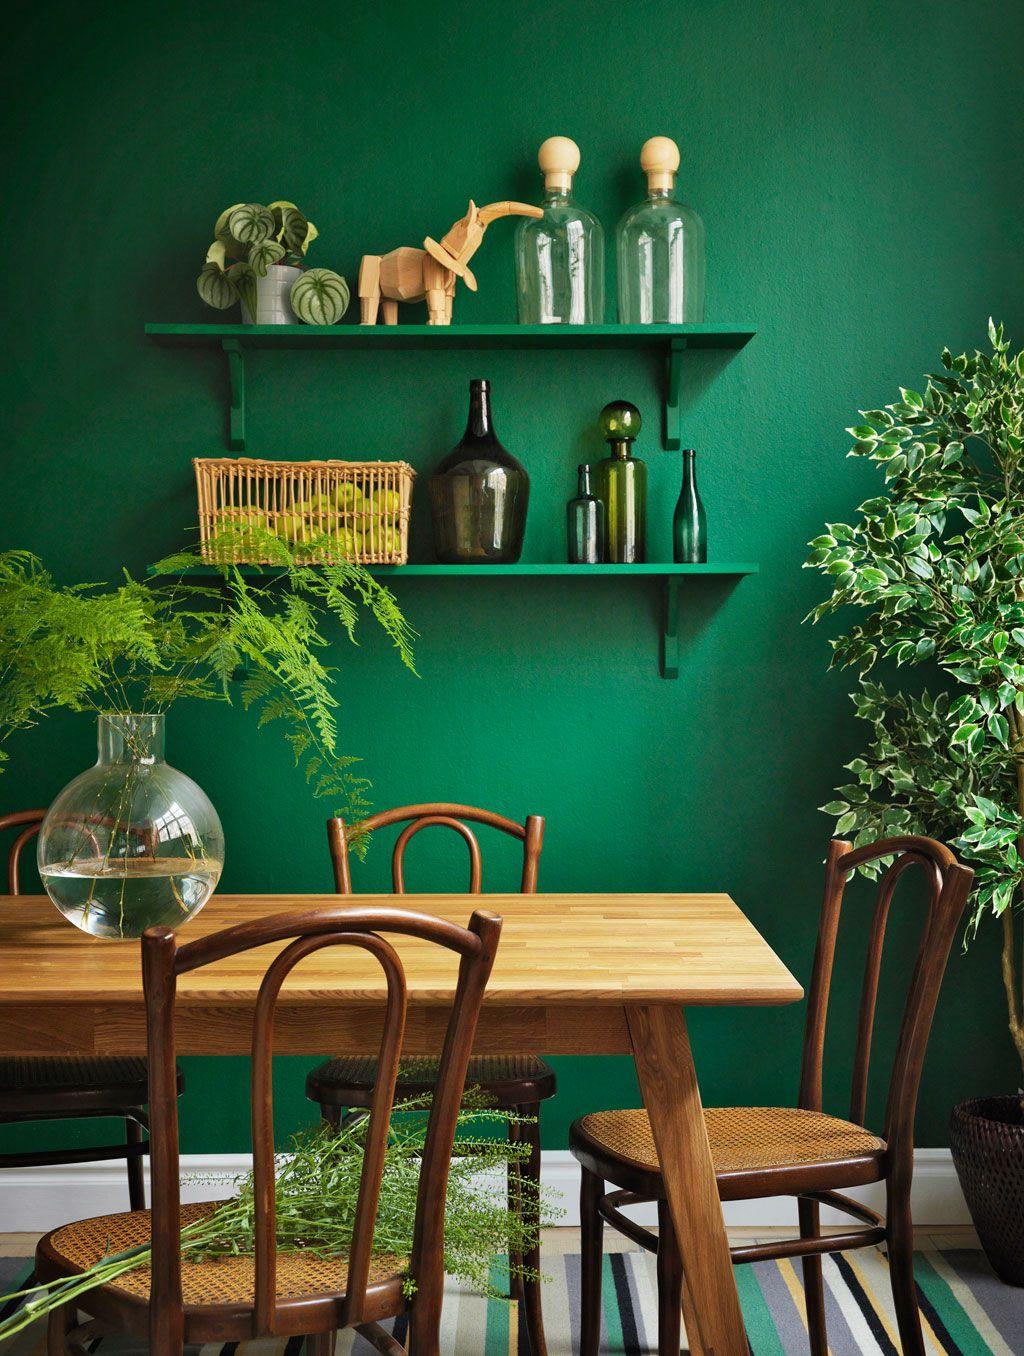 Gröna vardagsrumsidéer: väggar, stolar, färg